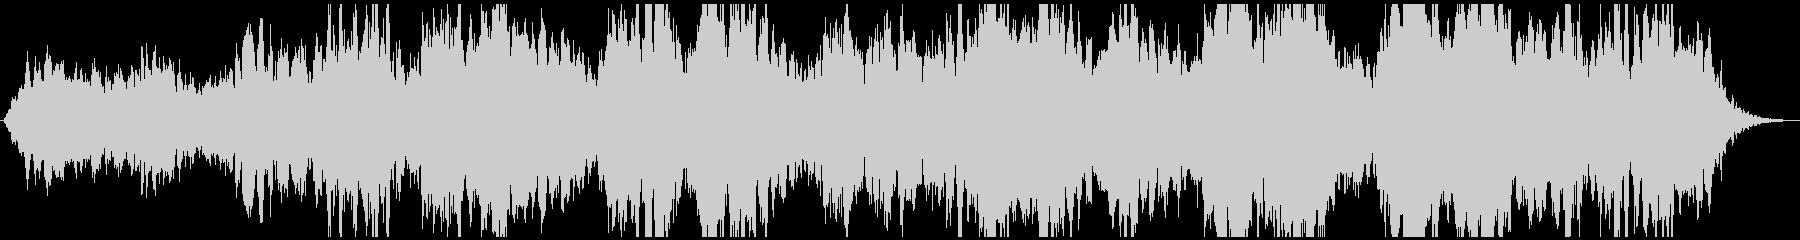 PADS ジャングルフルート01の未再生の波形